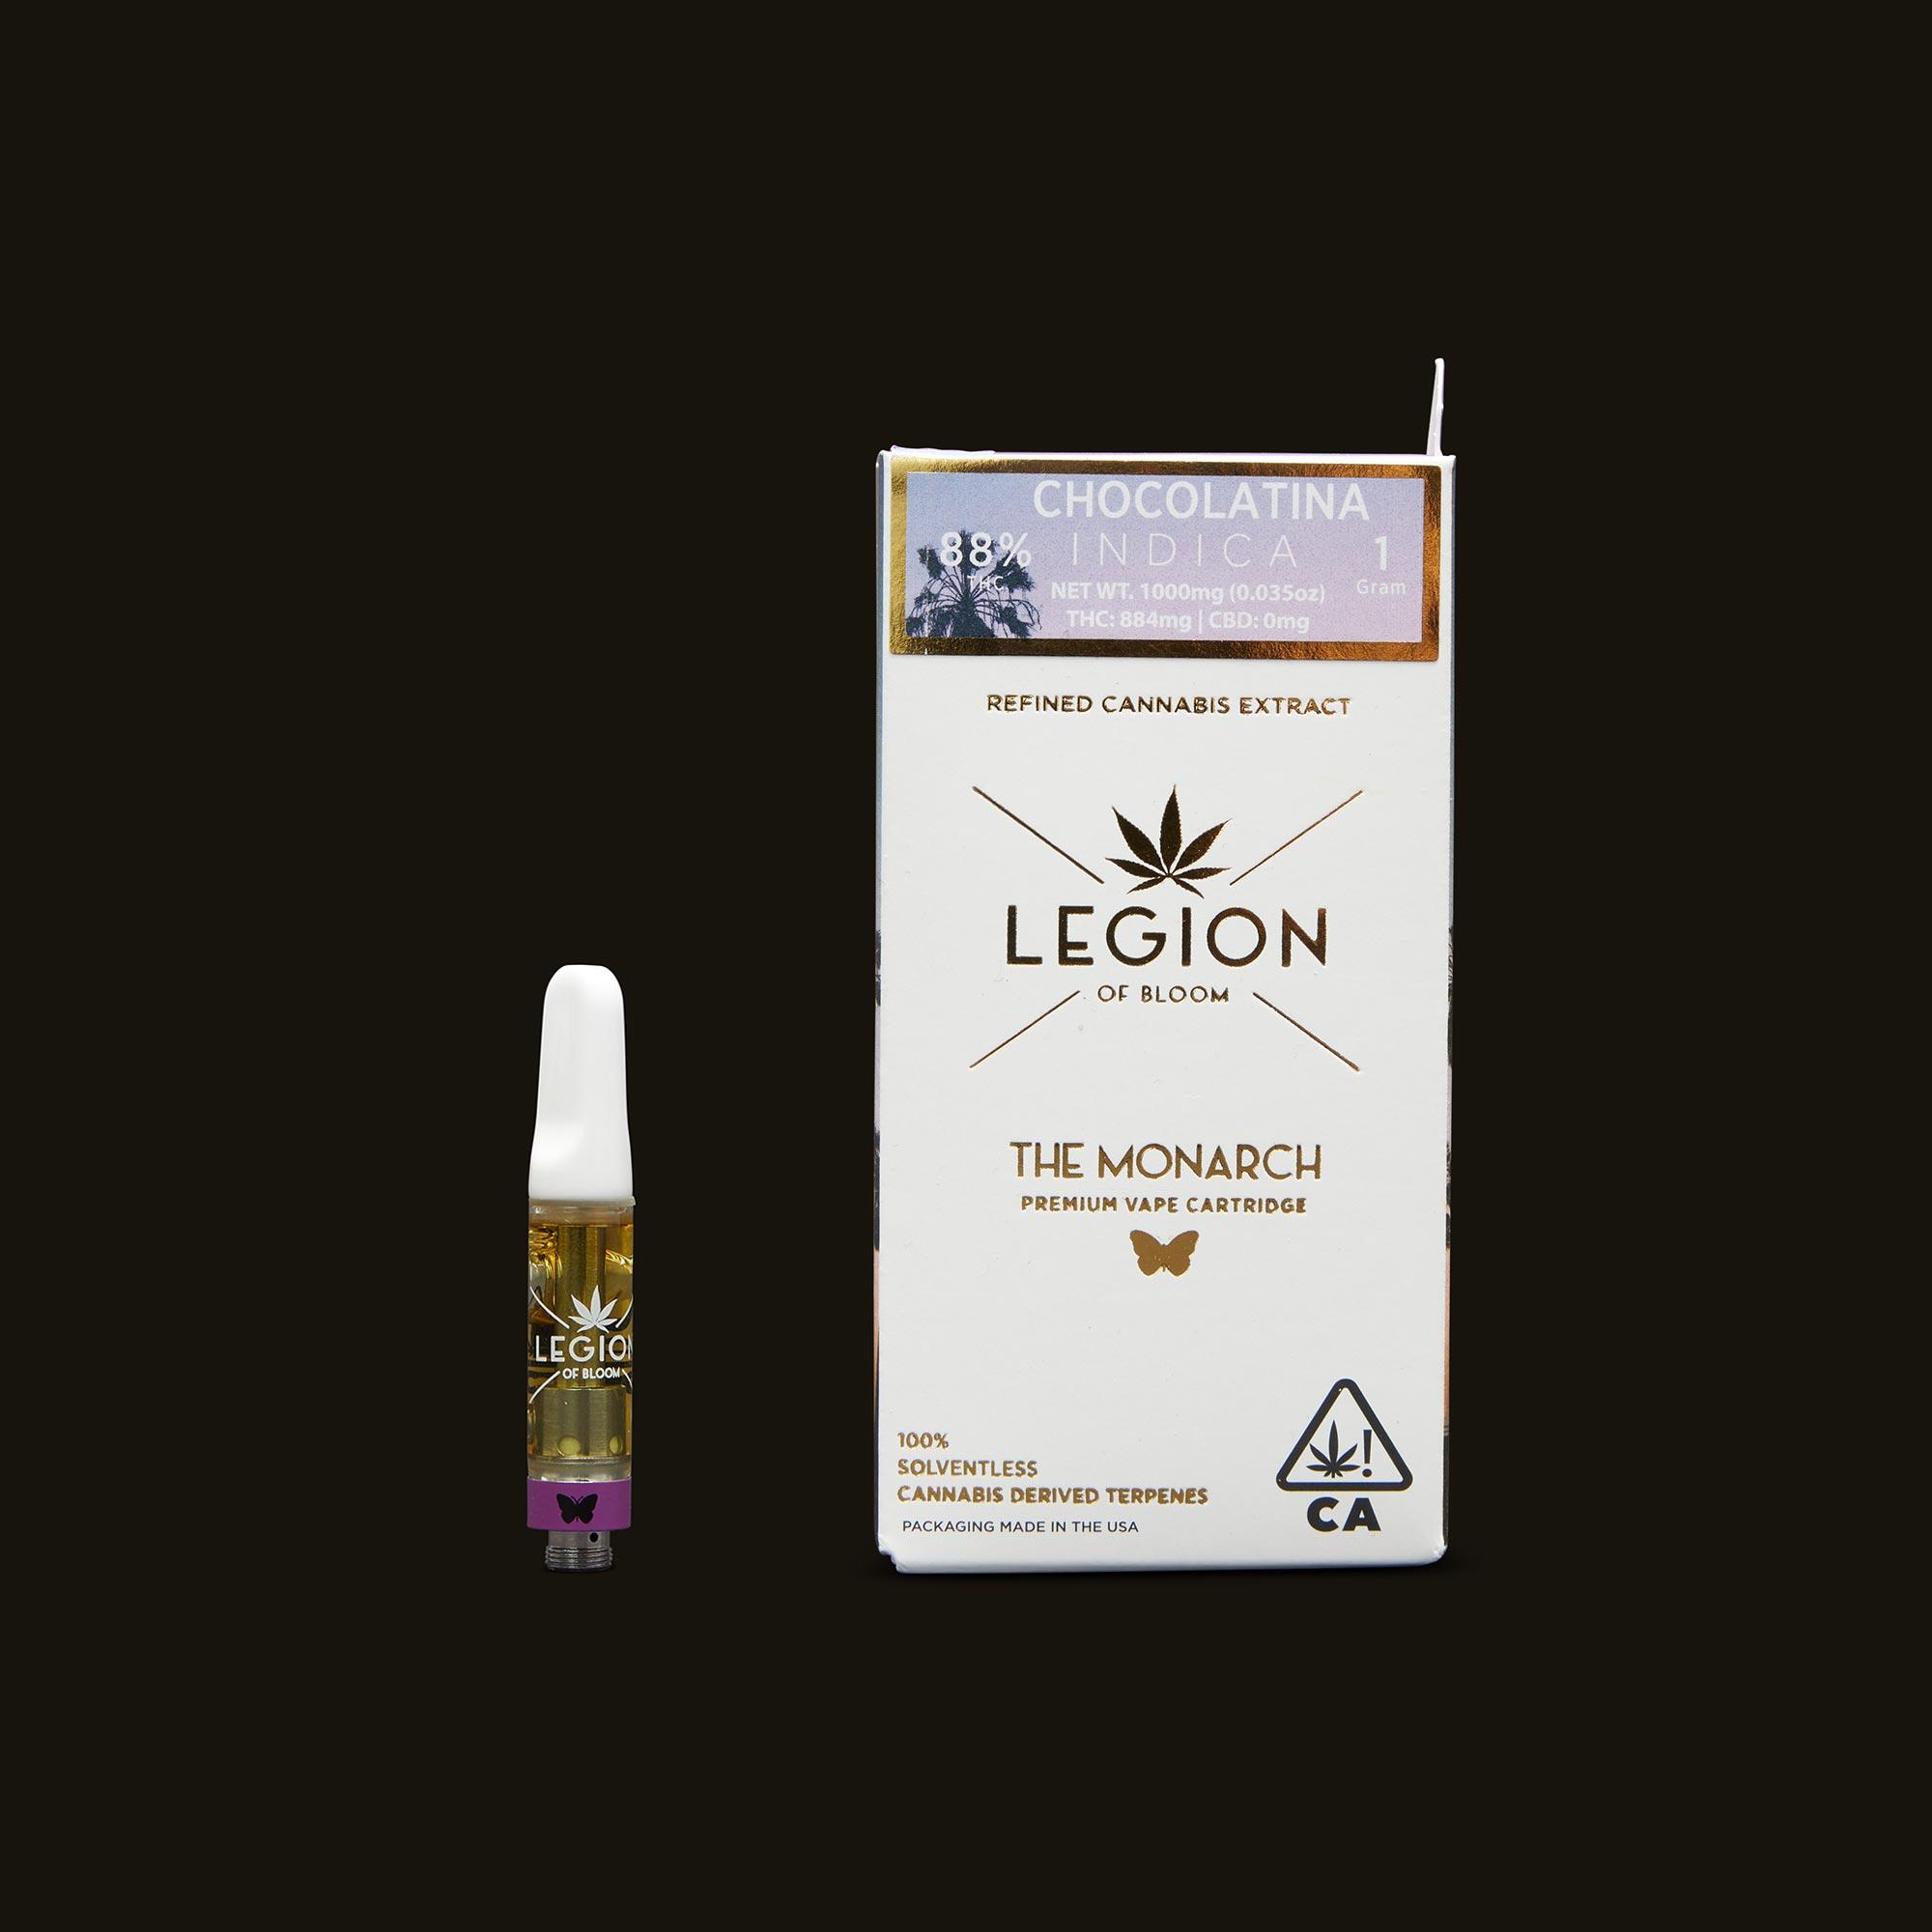 Legion of Bloom Chocolatina Monarch 1g